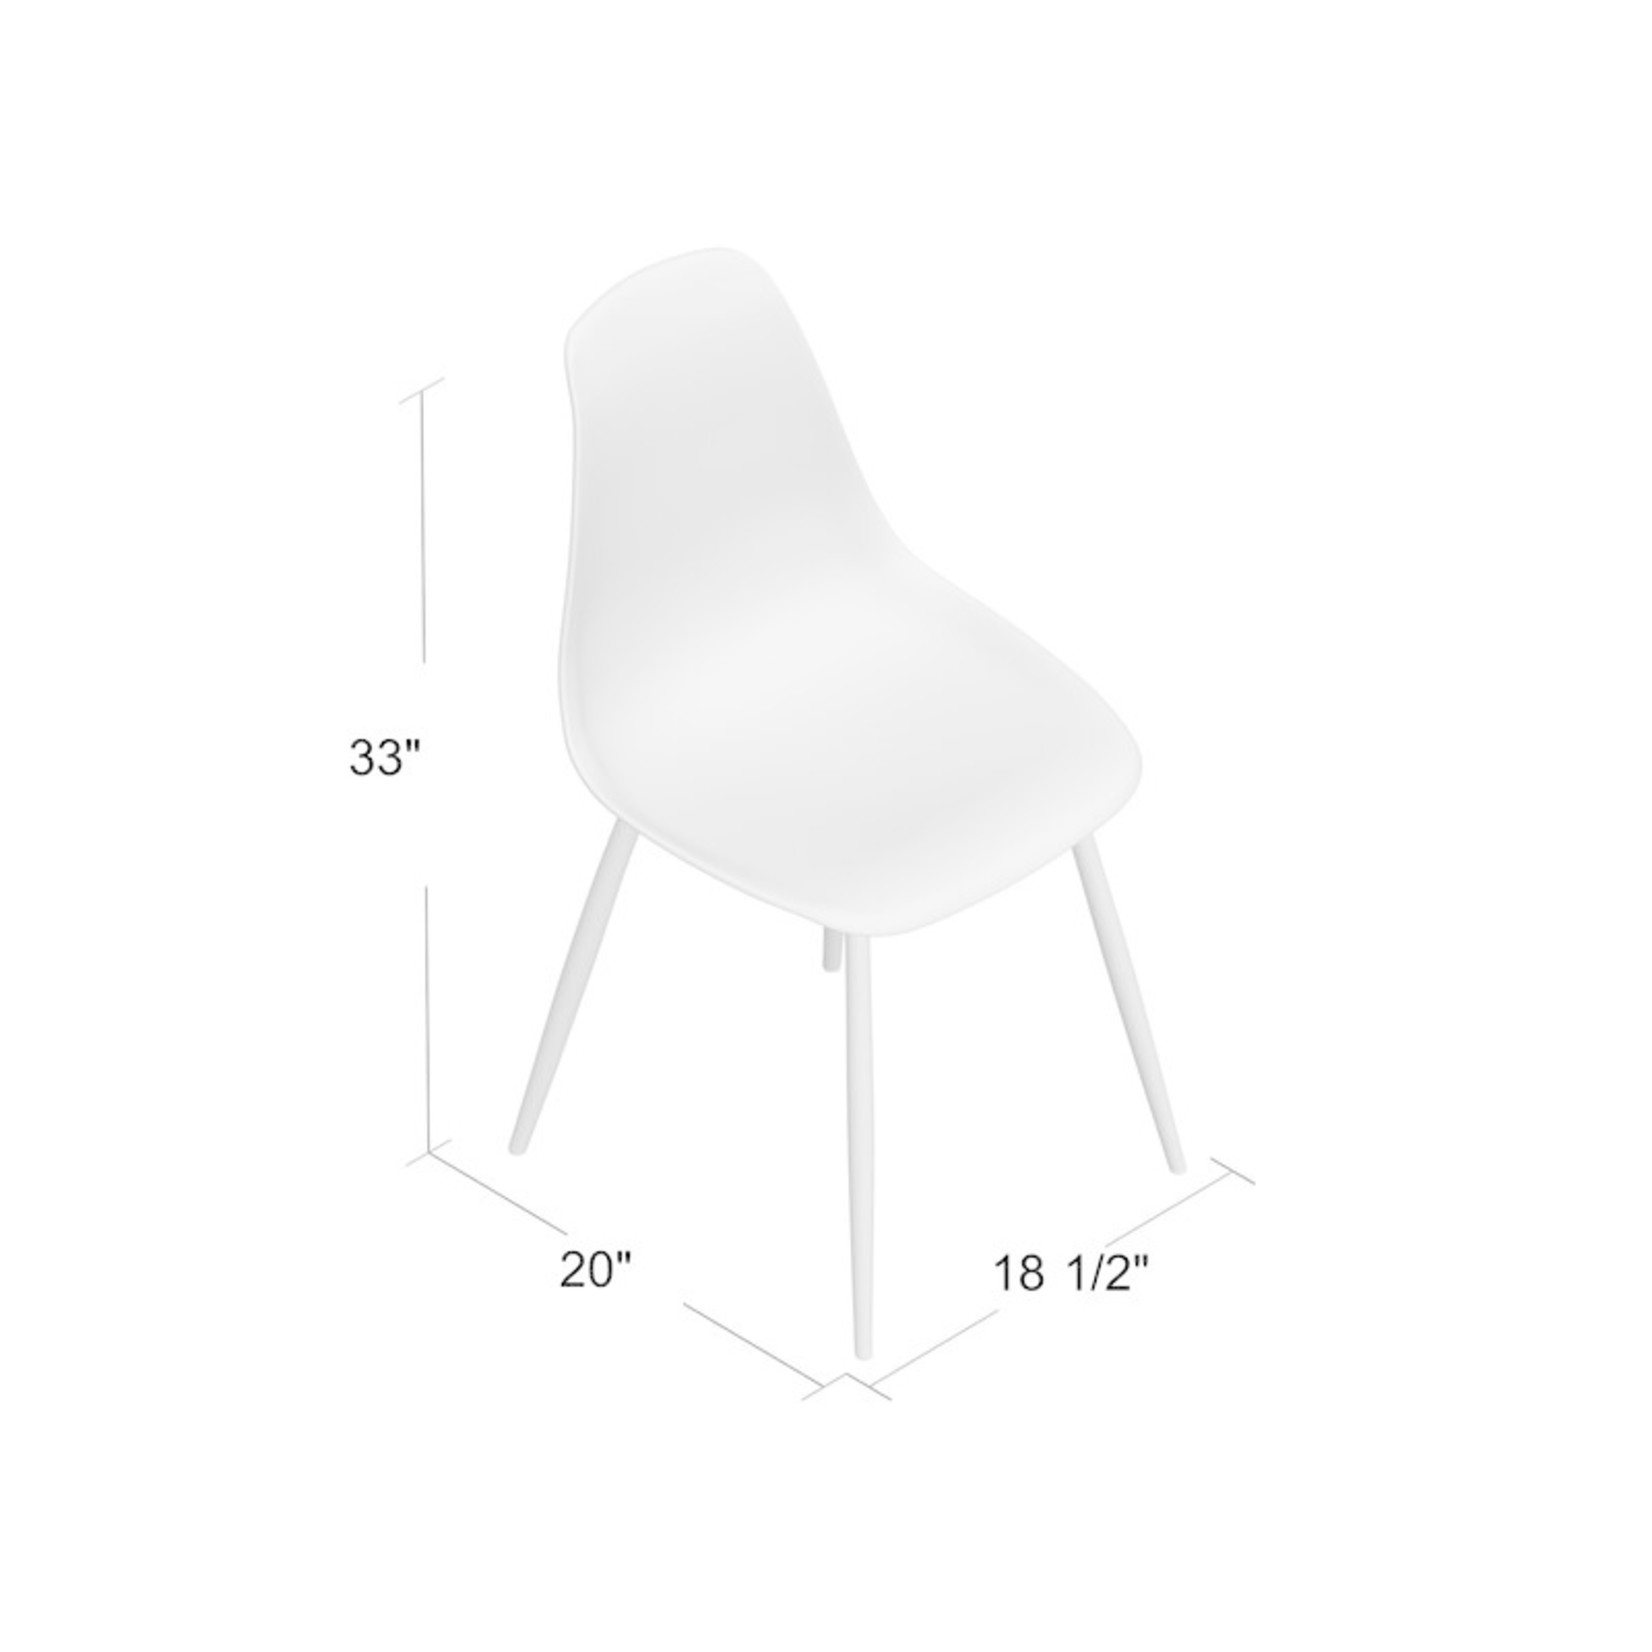 *Cockermouth Side Chair - Smoke Gray and Walnut - Set of 4